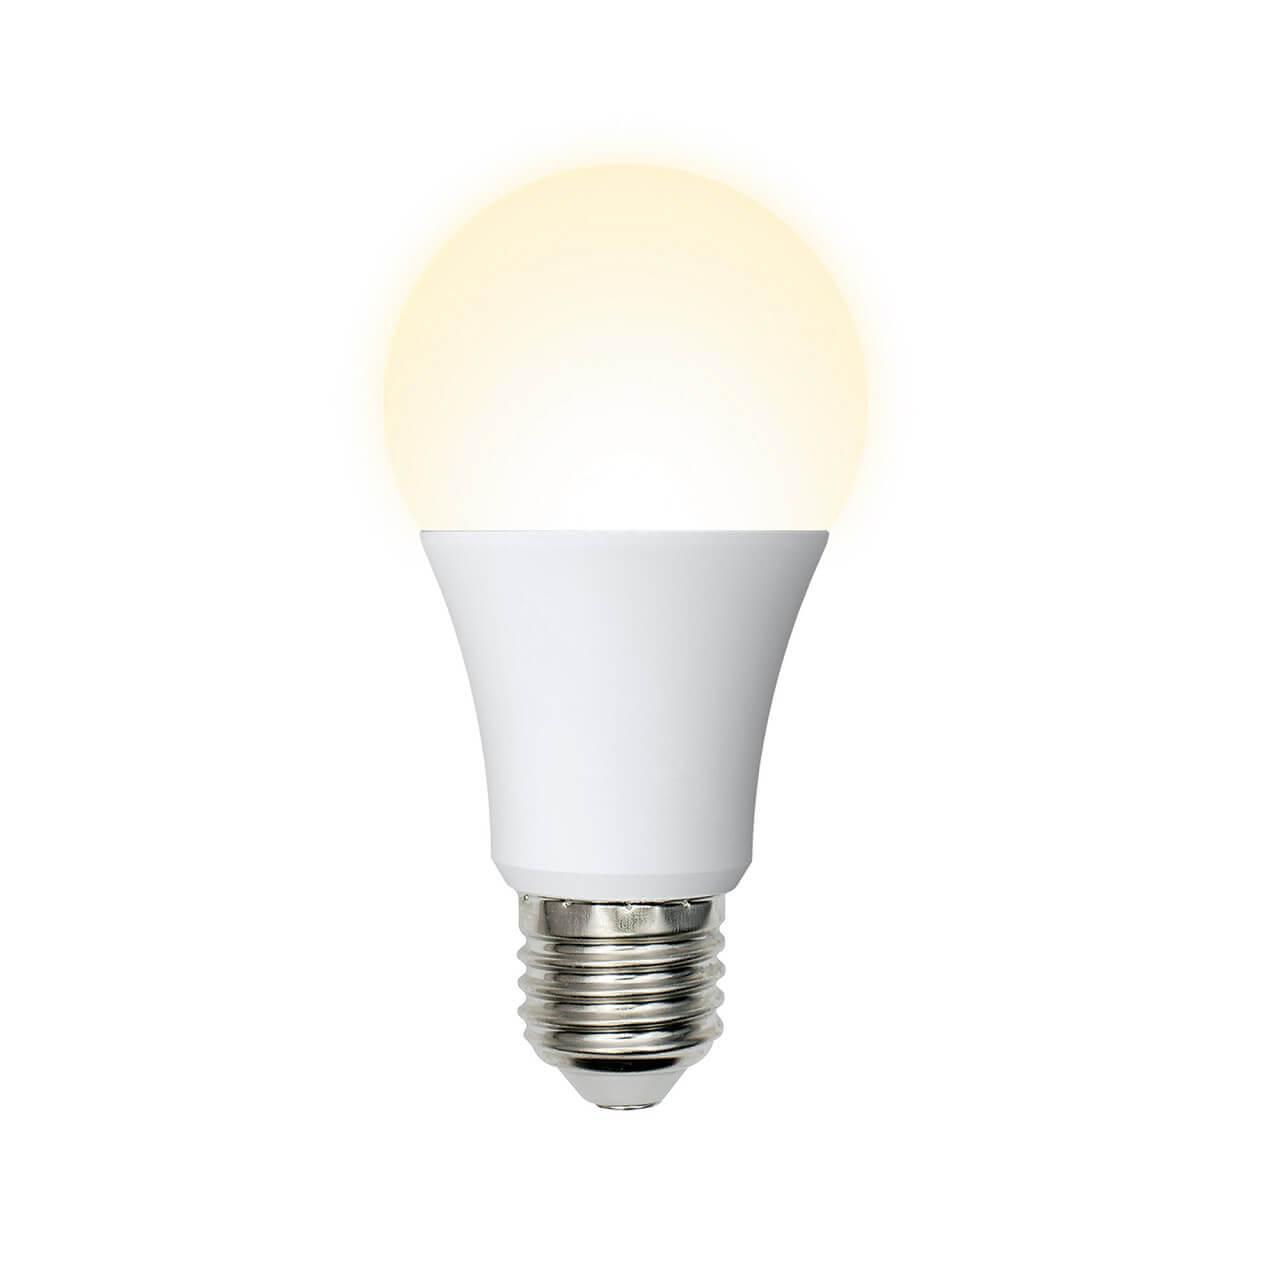 Лампа светодиодная (UL-00000959) E27 11W 3000K матовая LED-A60-11W/WW/E27/FR/O